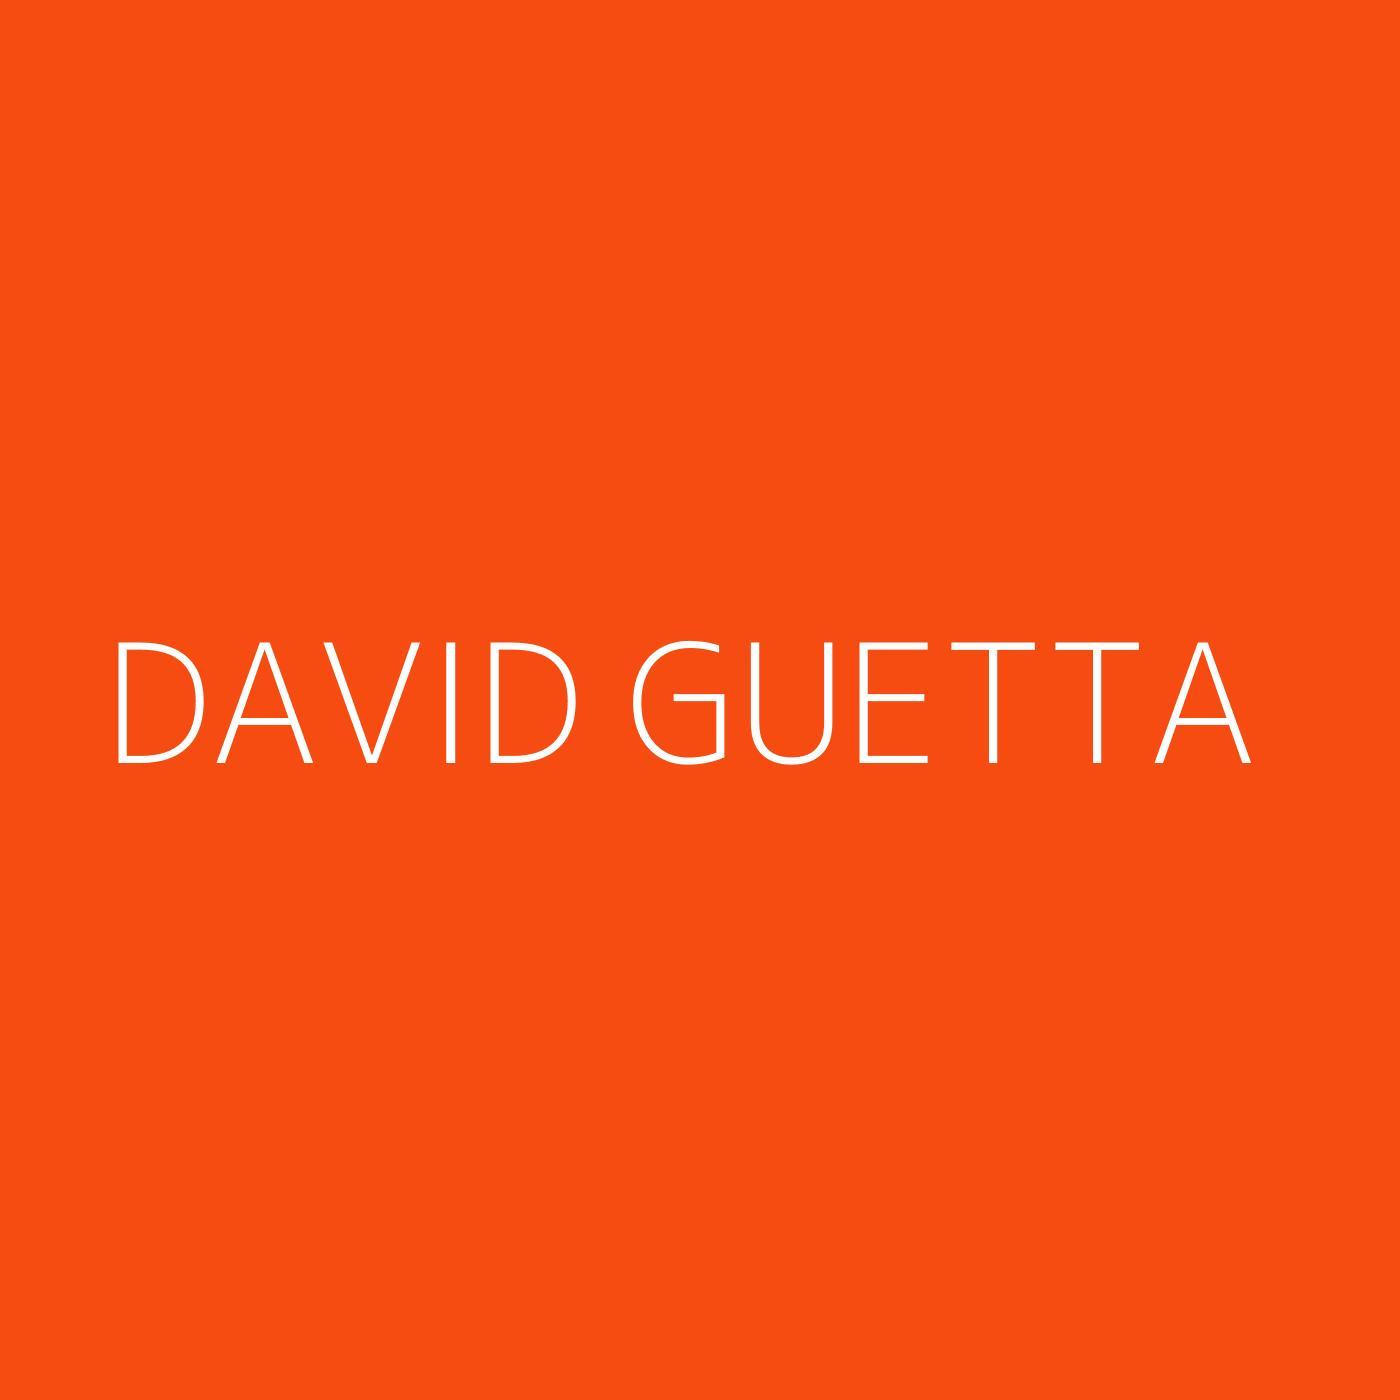 David Guetta Playlist Artwork